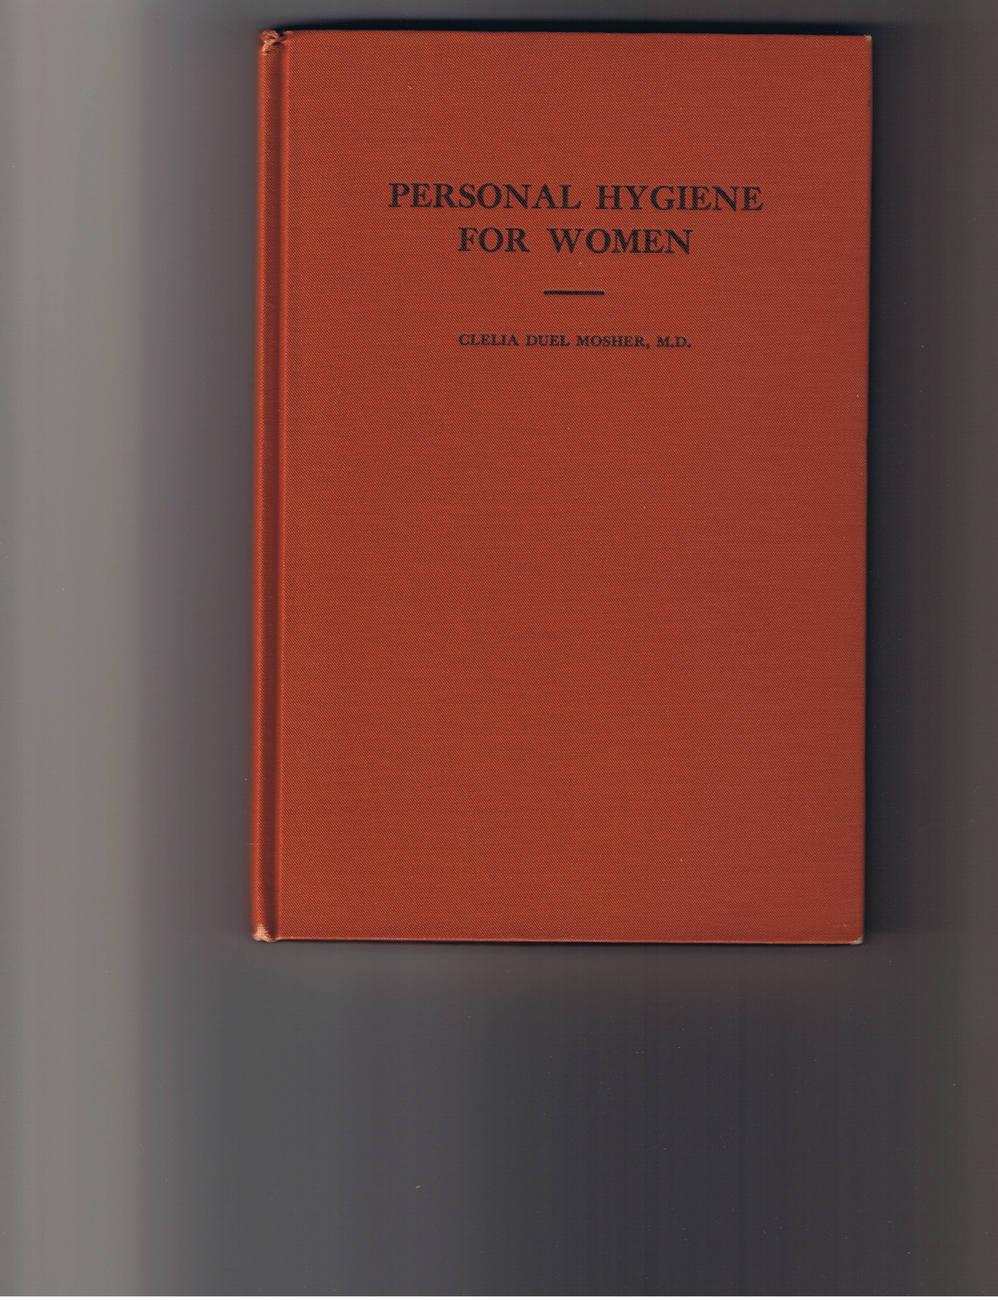 Personal hygiene for women